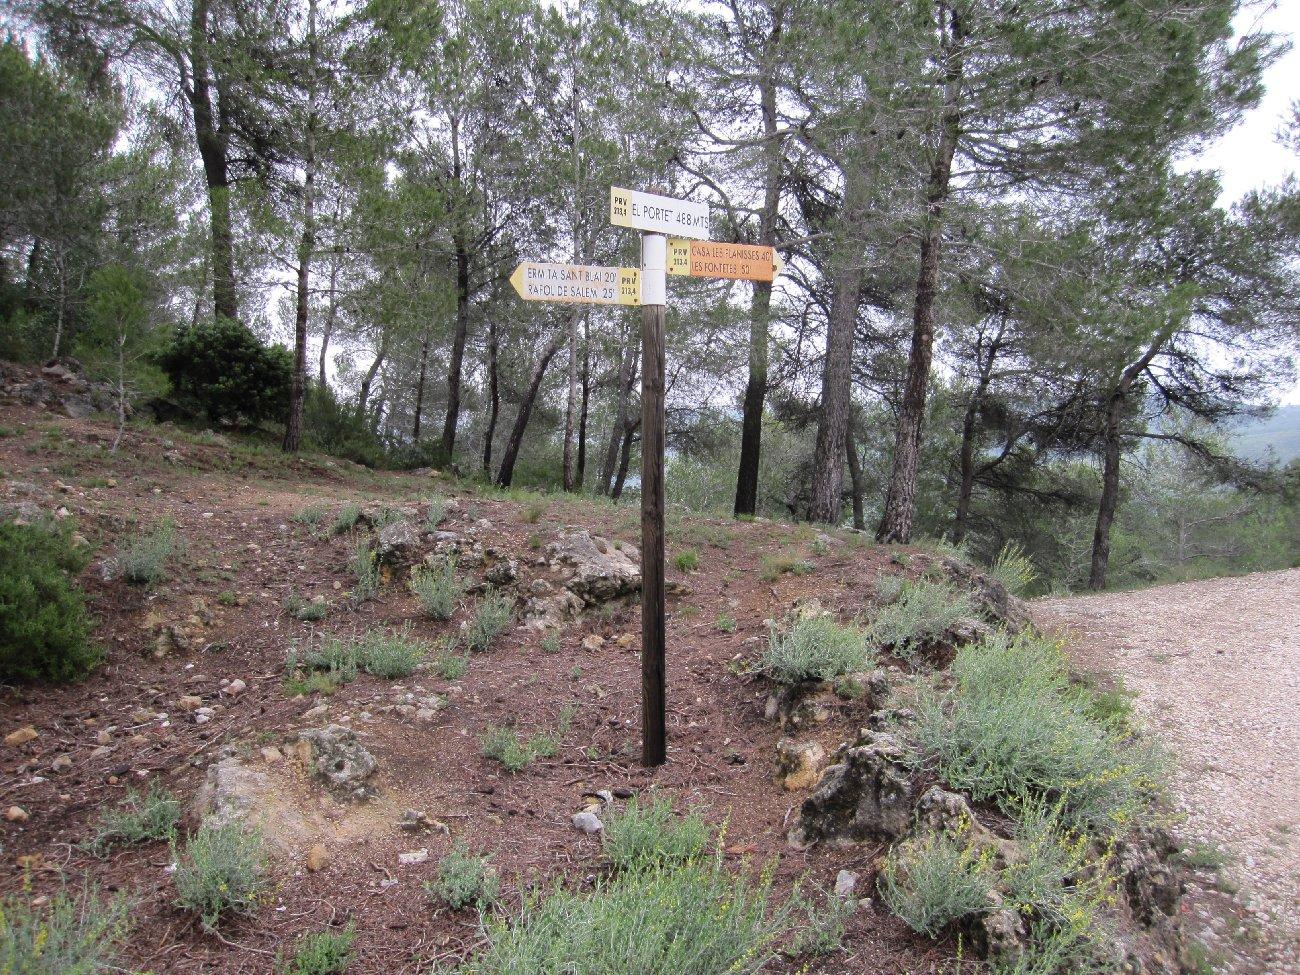 El Portet del Benicadell